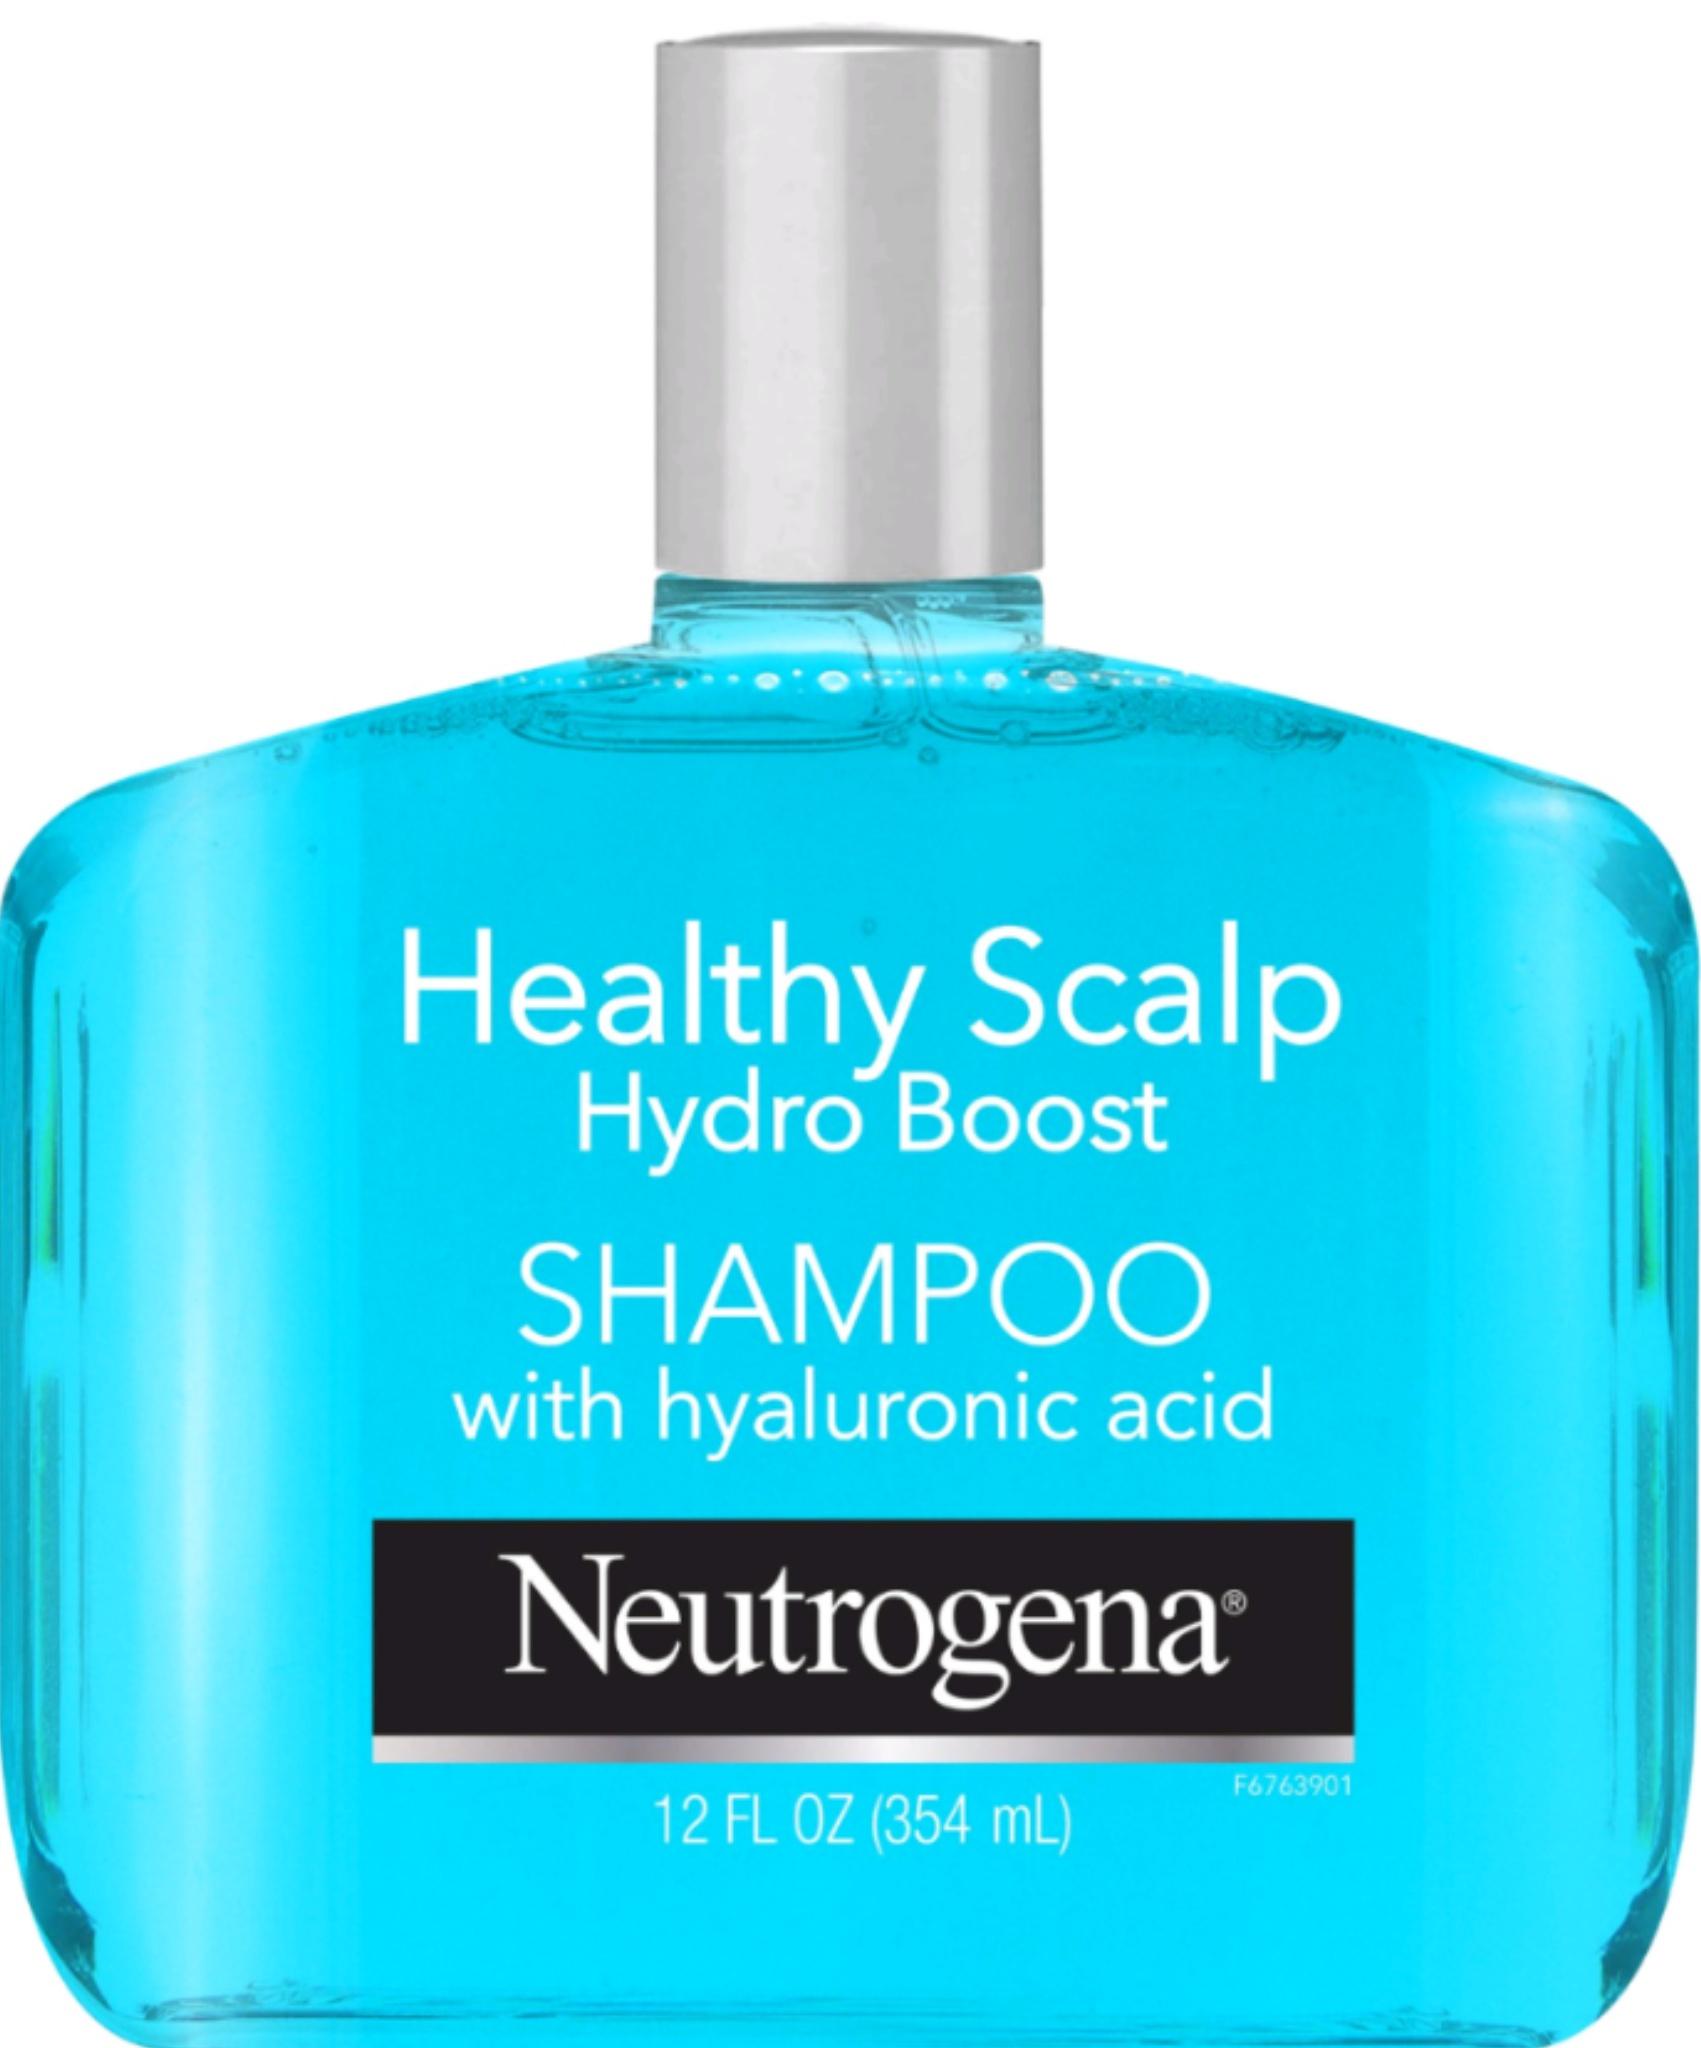 Neutrogena Healthy Scalp Hydro Boost Shampoo